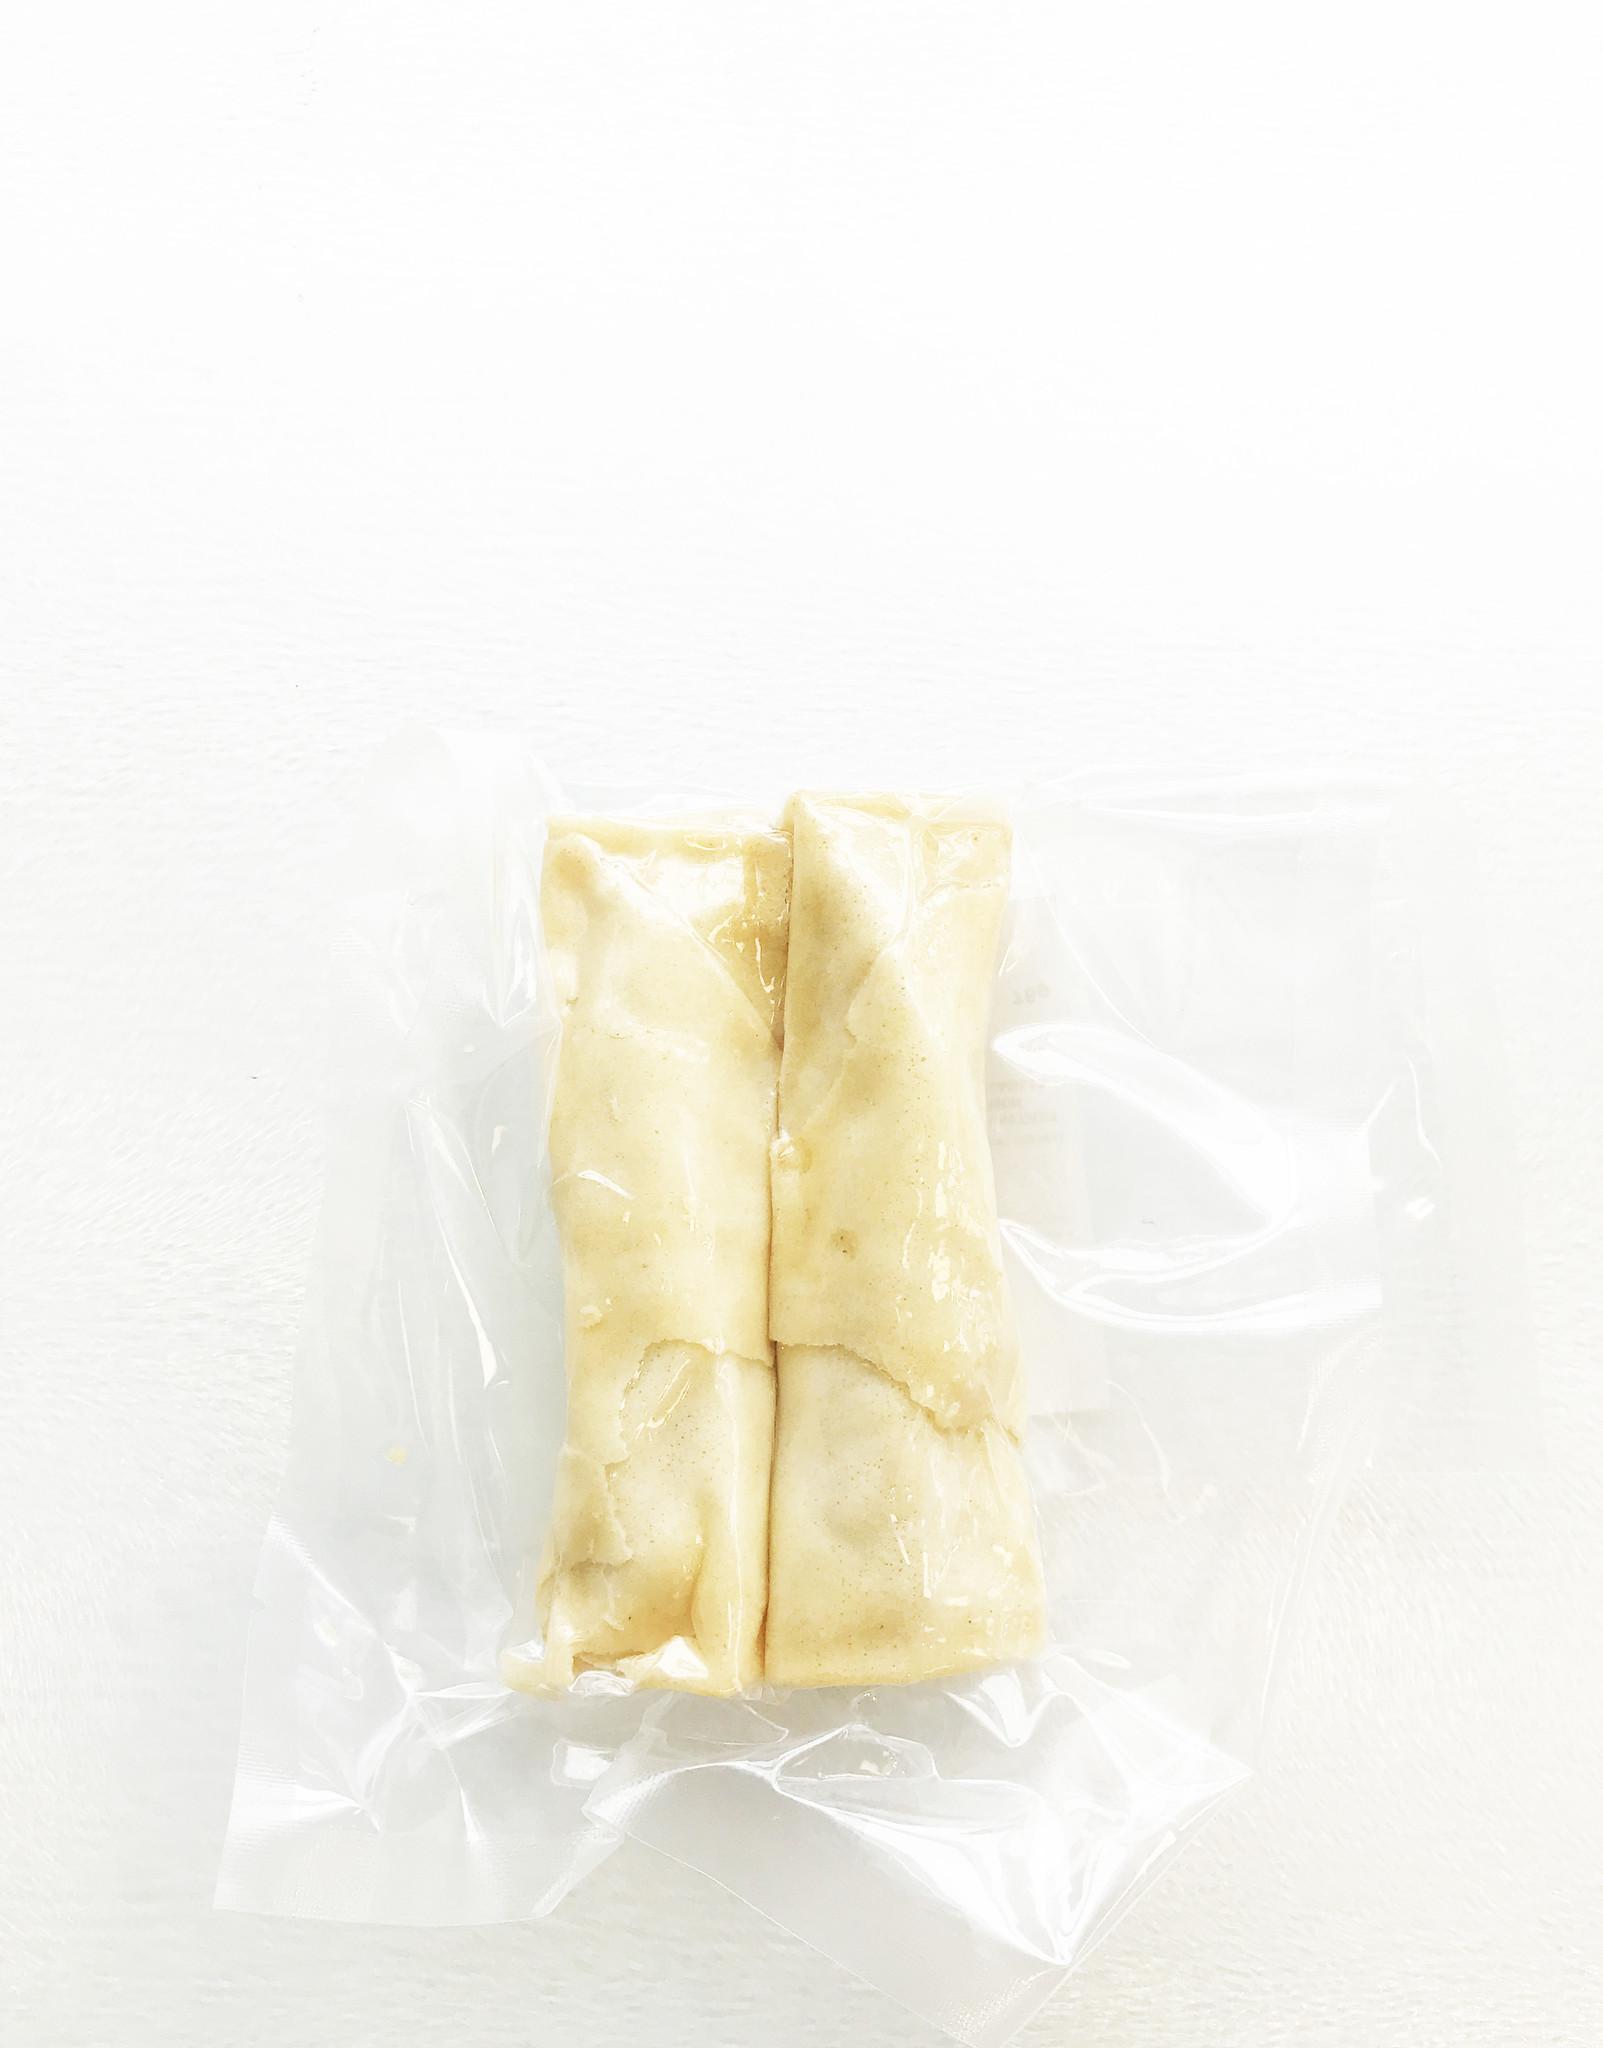 Pork & vegetable imperial rolls